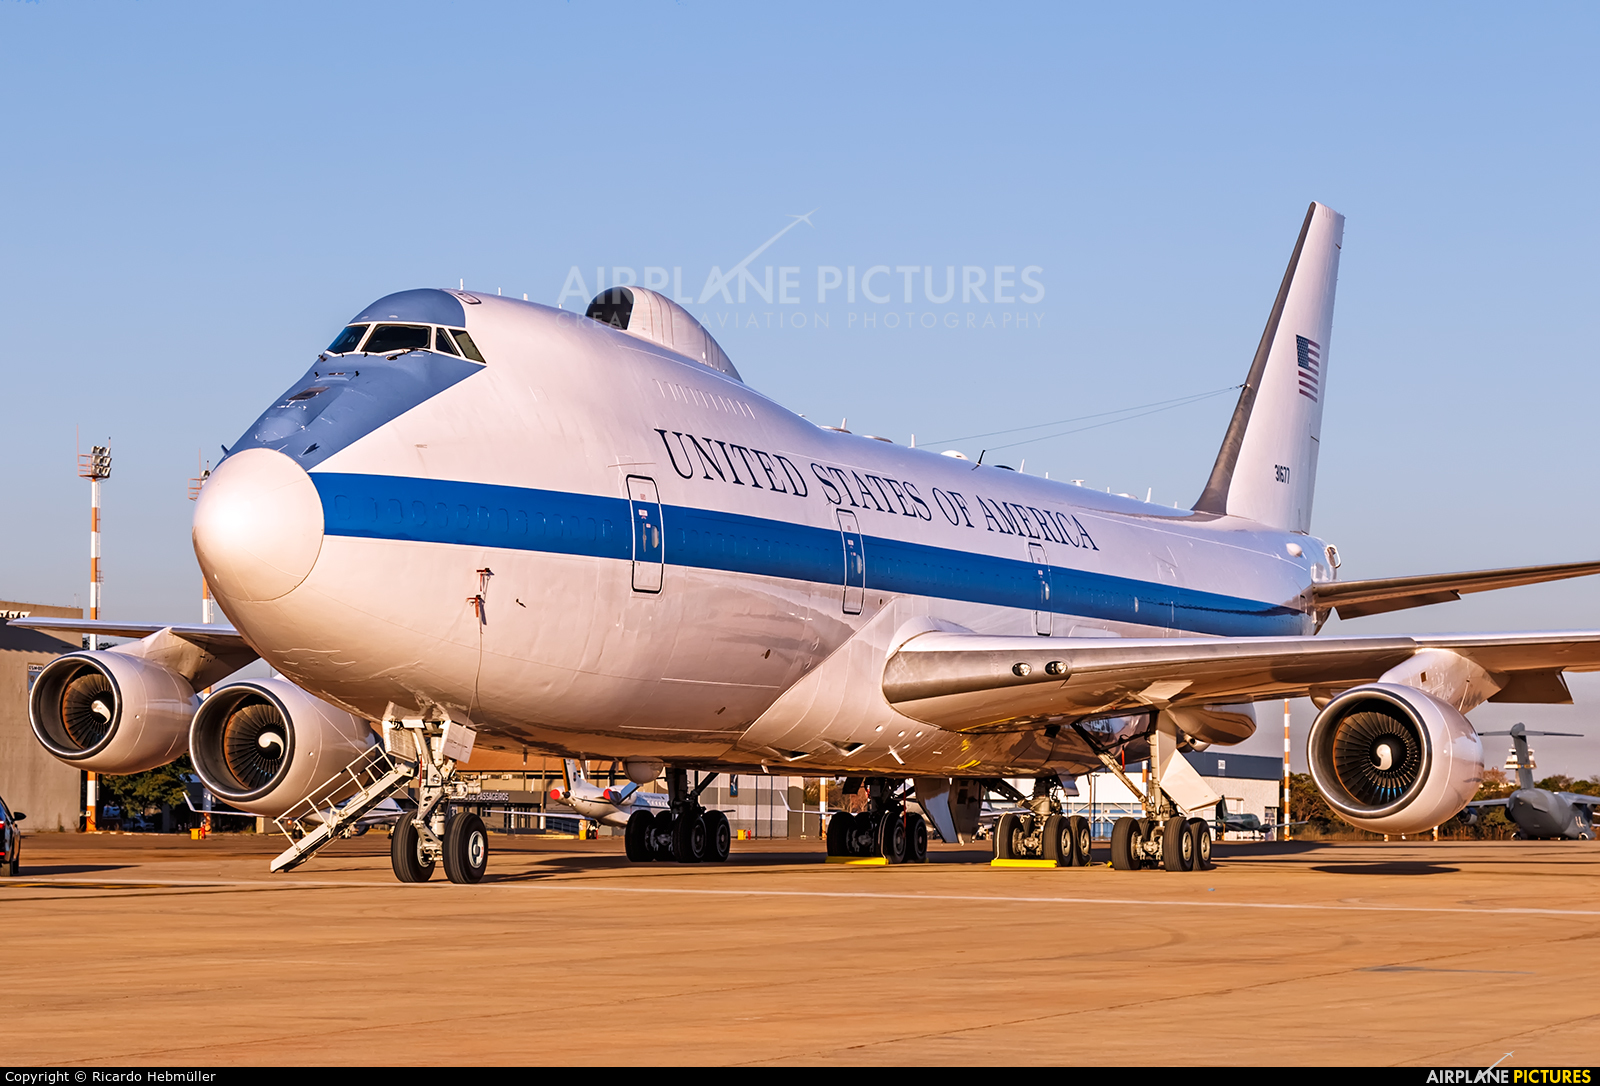 USA - Air Force 73-1677 aircraft at Brasília - Presidente Juscelino Kubitschek Intl